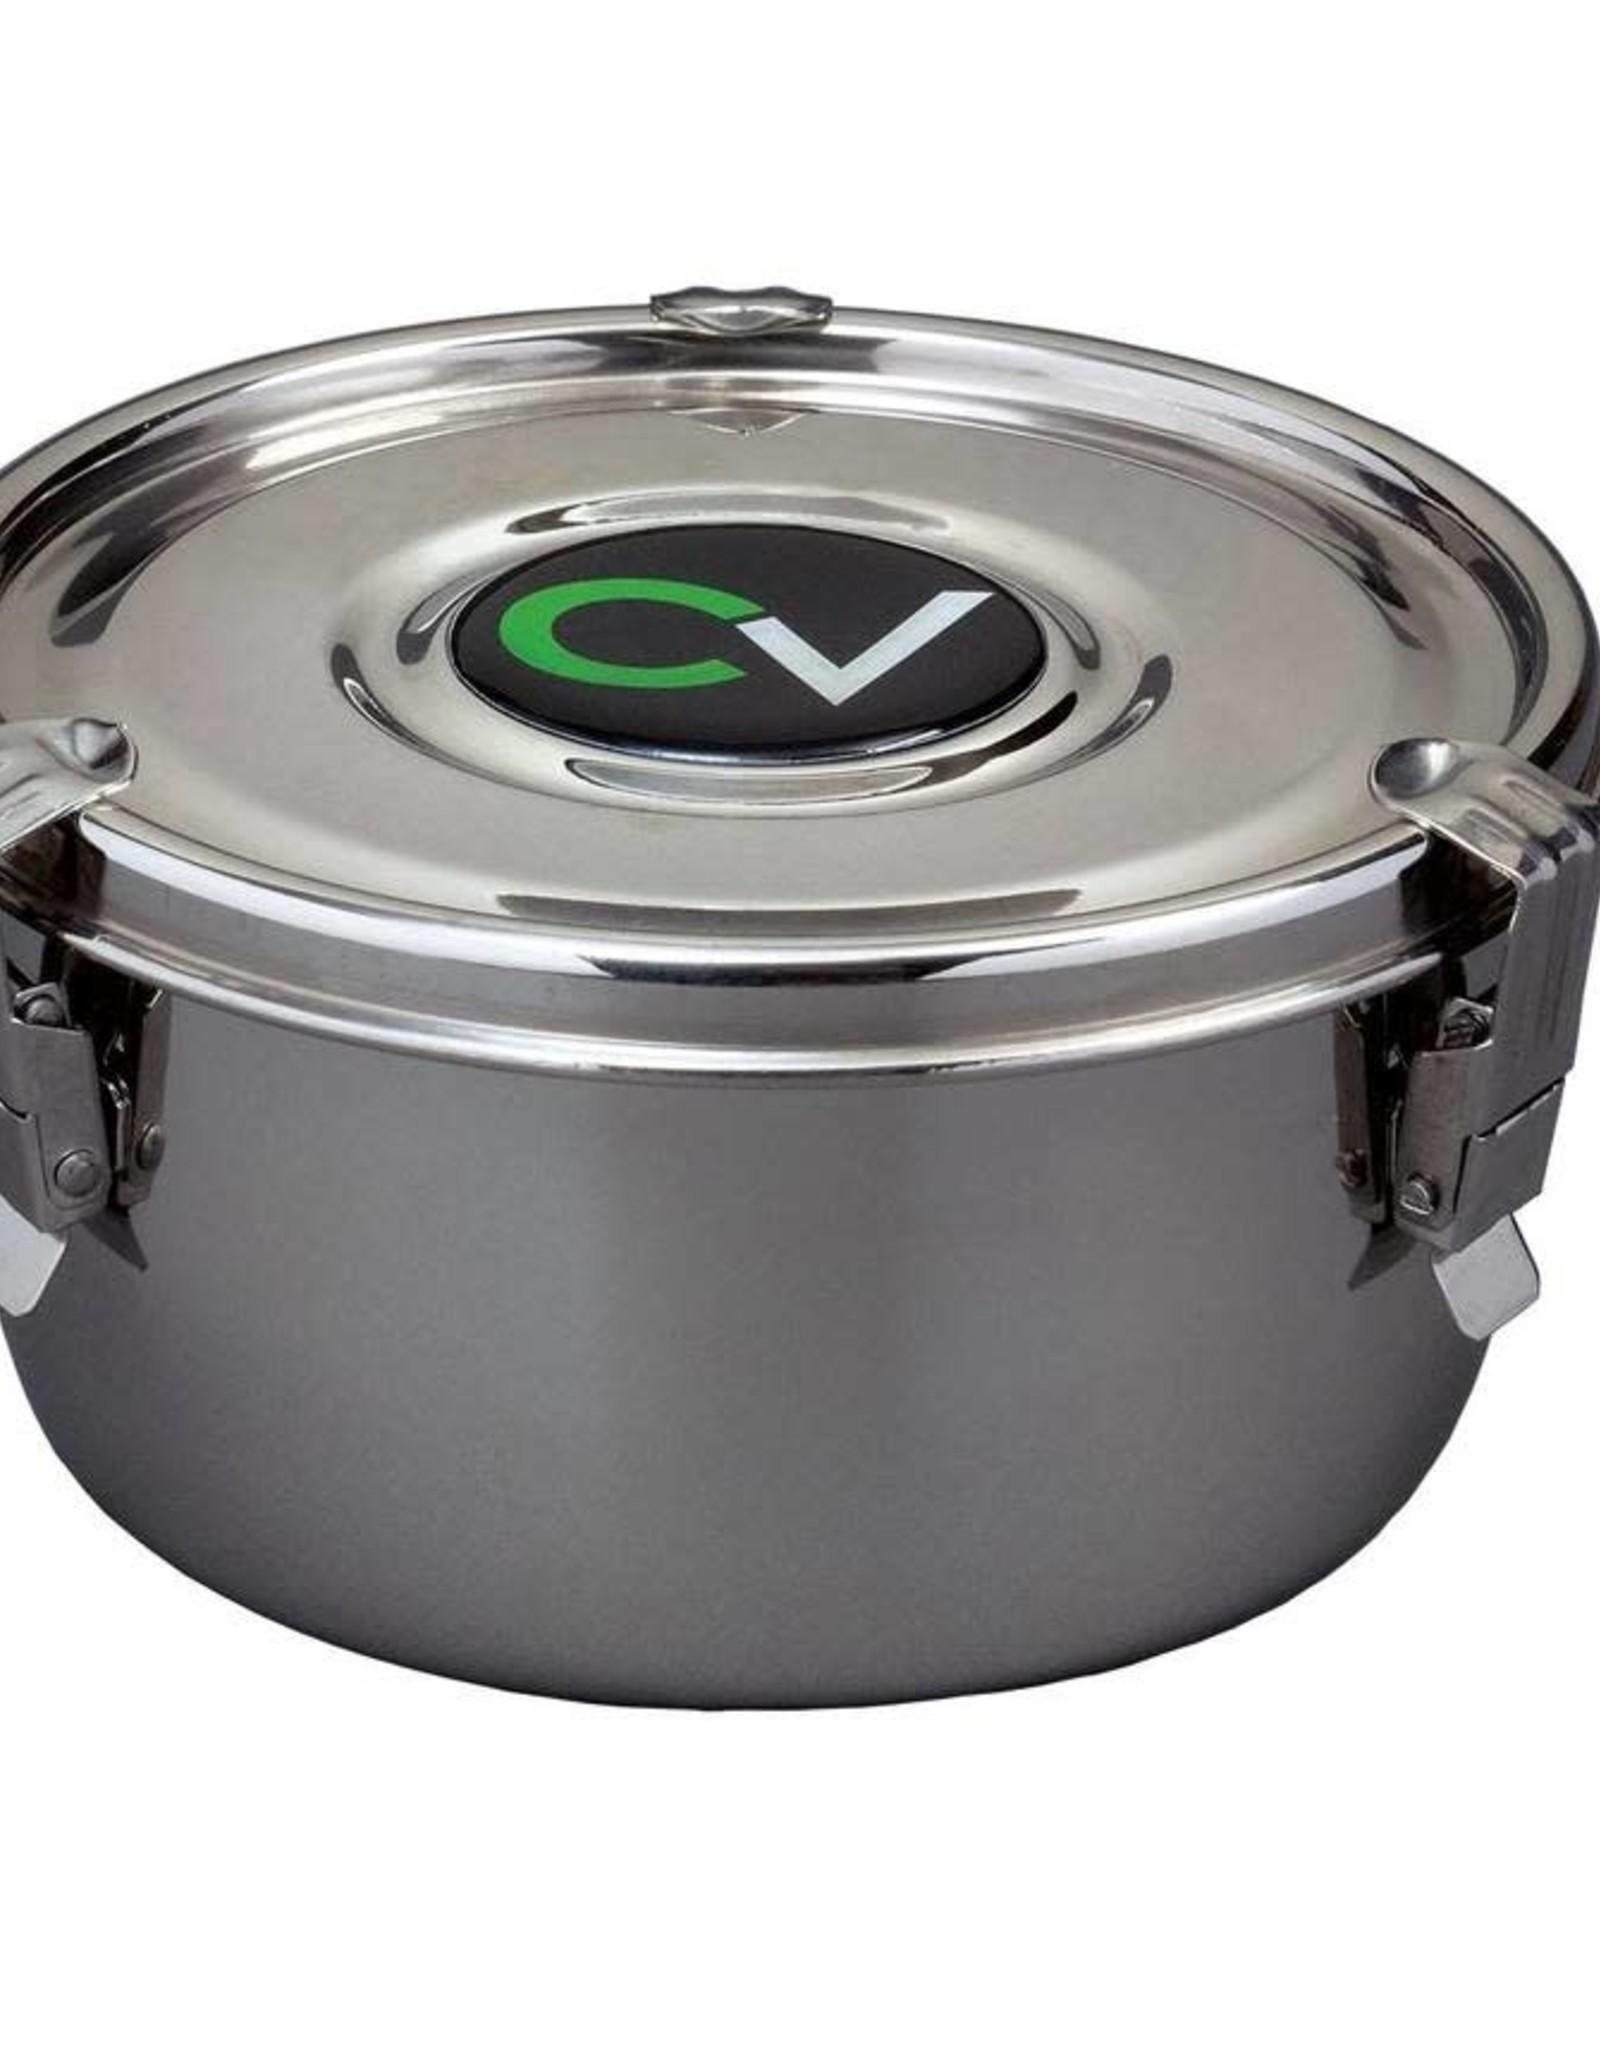 "CVault Large w/2x8 gram Boveda - 4.75""x2.5"""